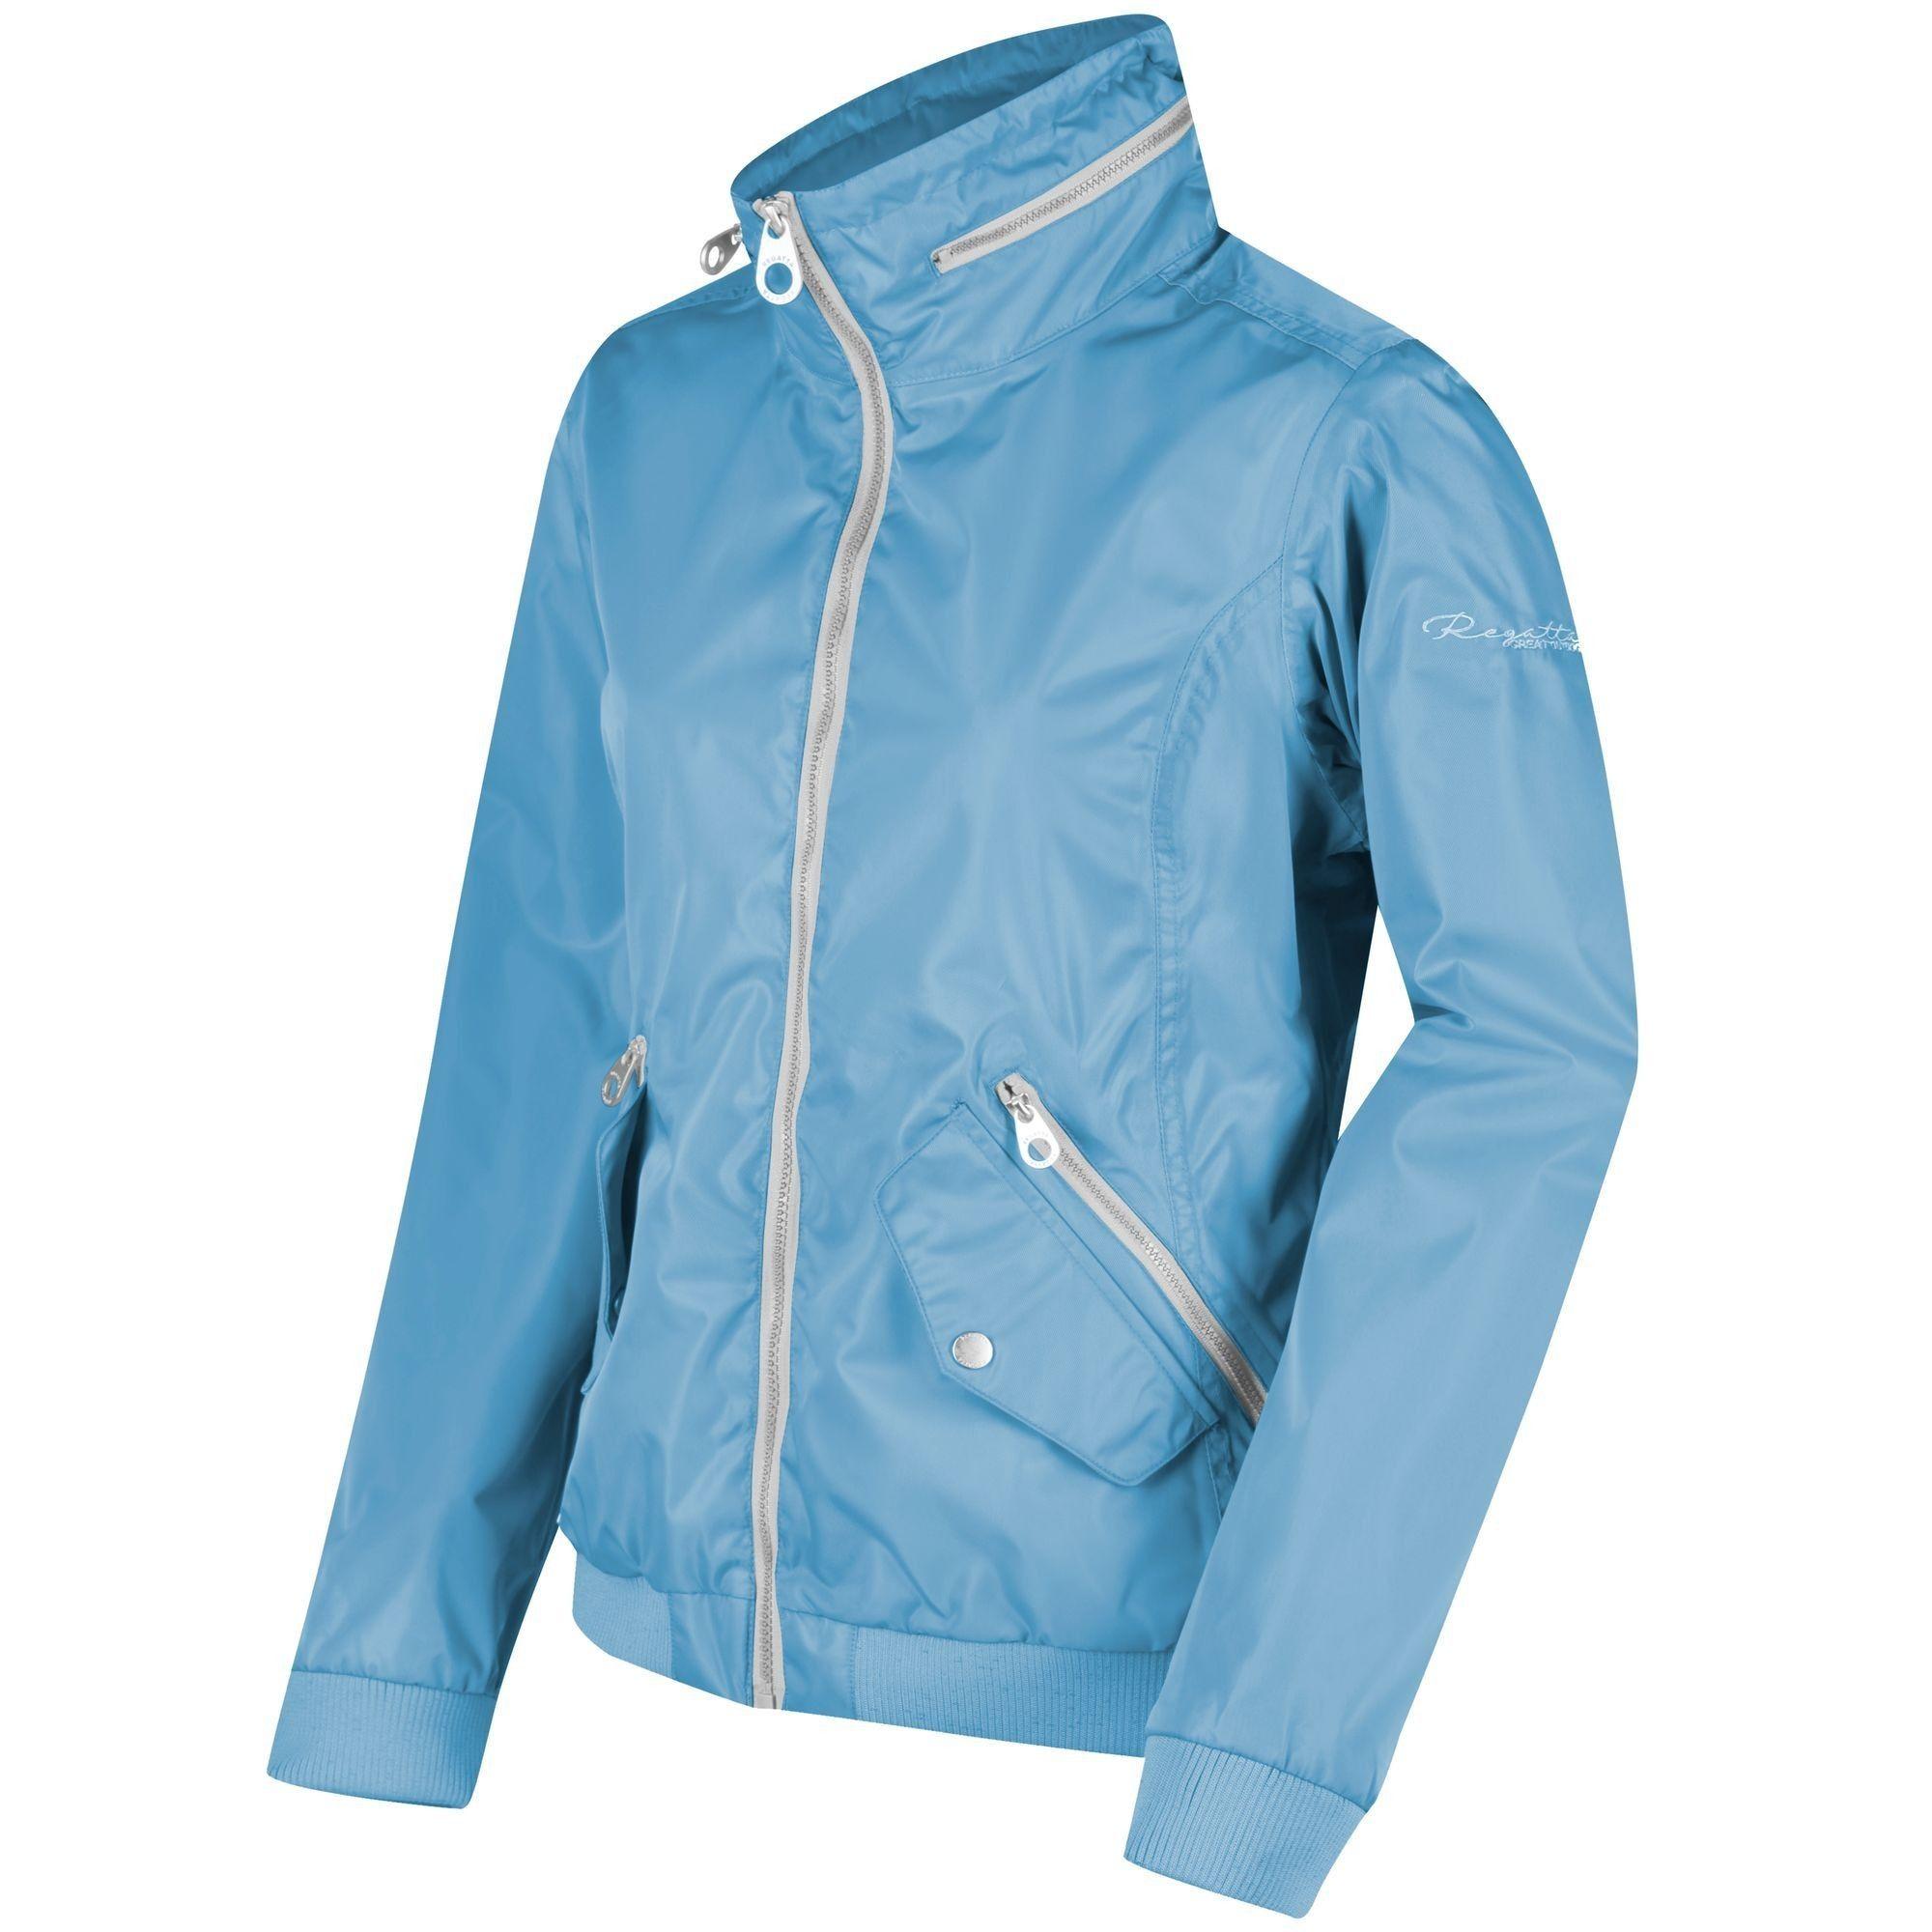 Regatta Great Outdoors Womens/Ladies Kadisha Lightweight Waterproof Festival Jacket